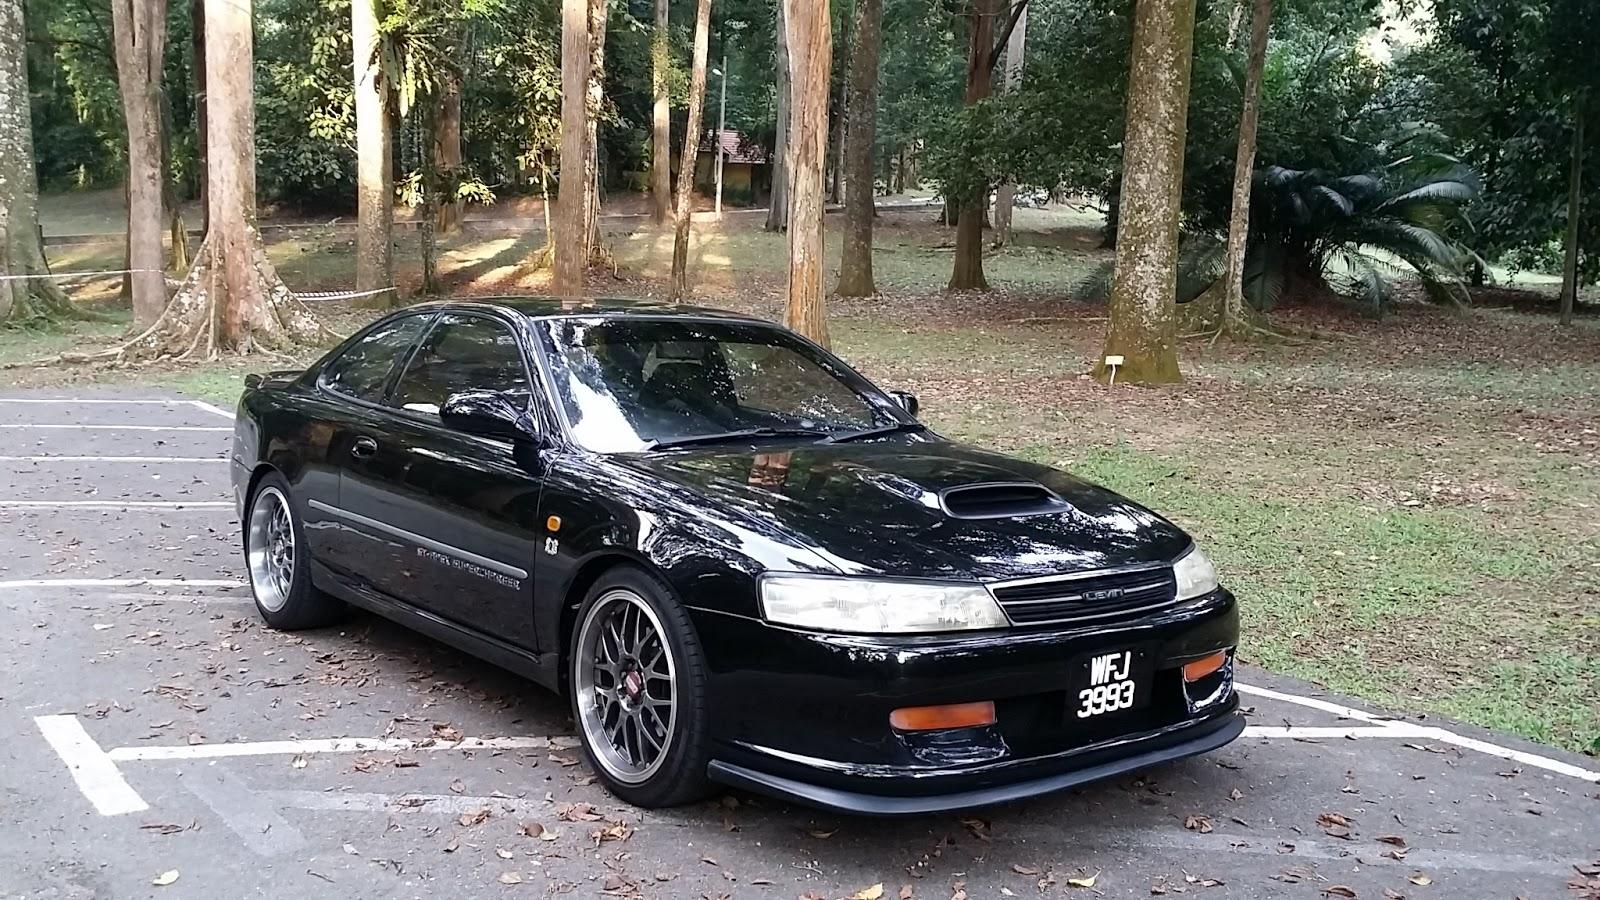 Toyota Levin GT-Z: Complete Restoration